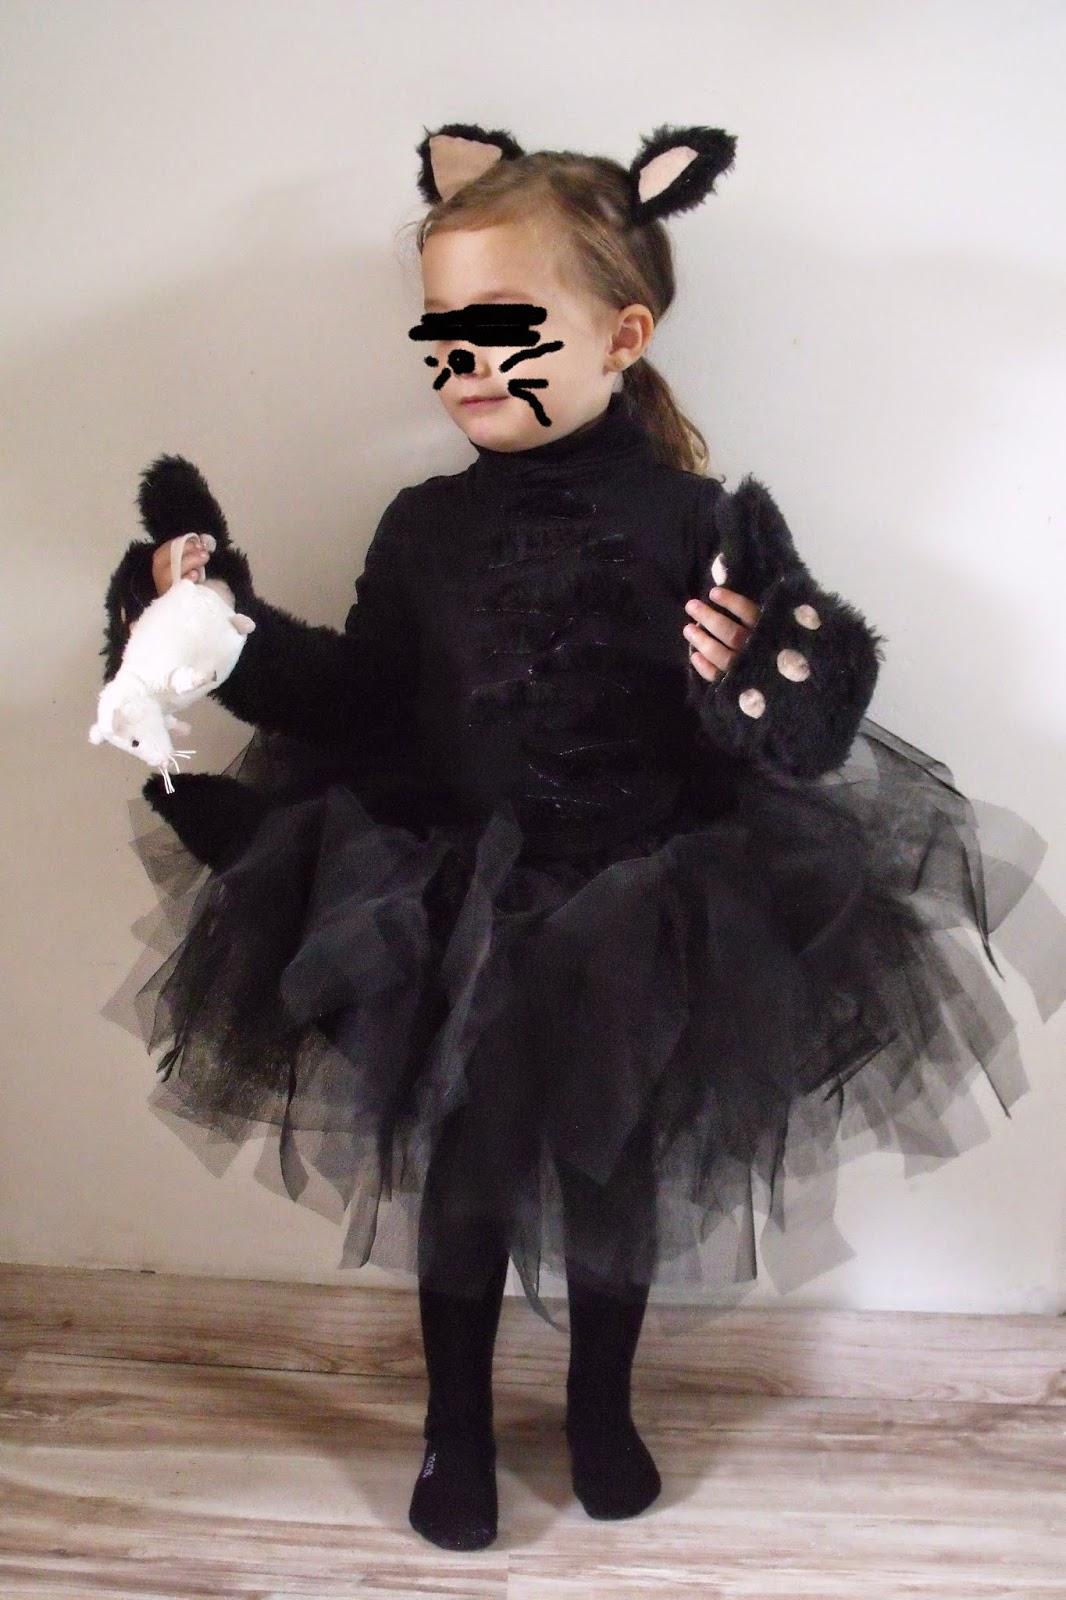 lili joue maman bricole tuto costume chat noir fille pour halloween. Black Bedroom Furniture Sets. Home Design Ideas